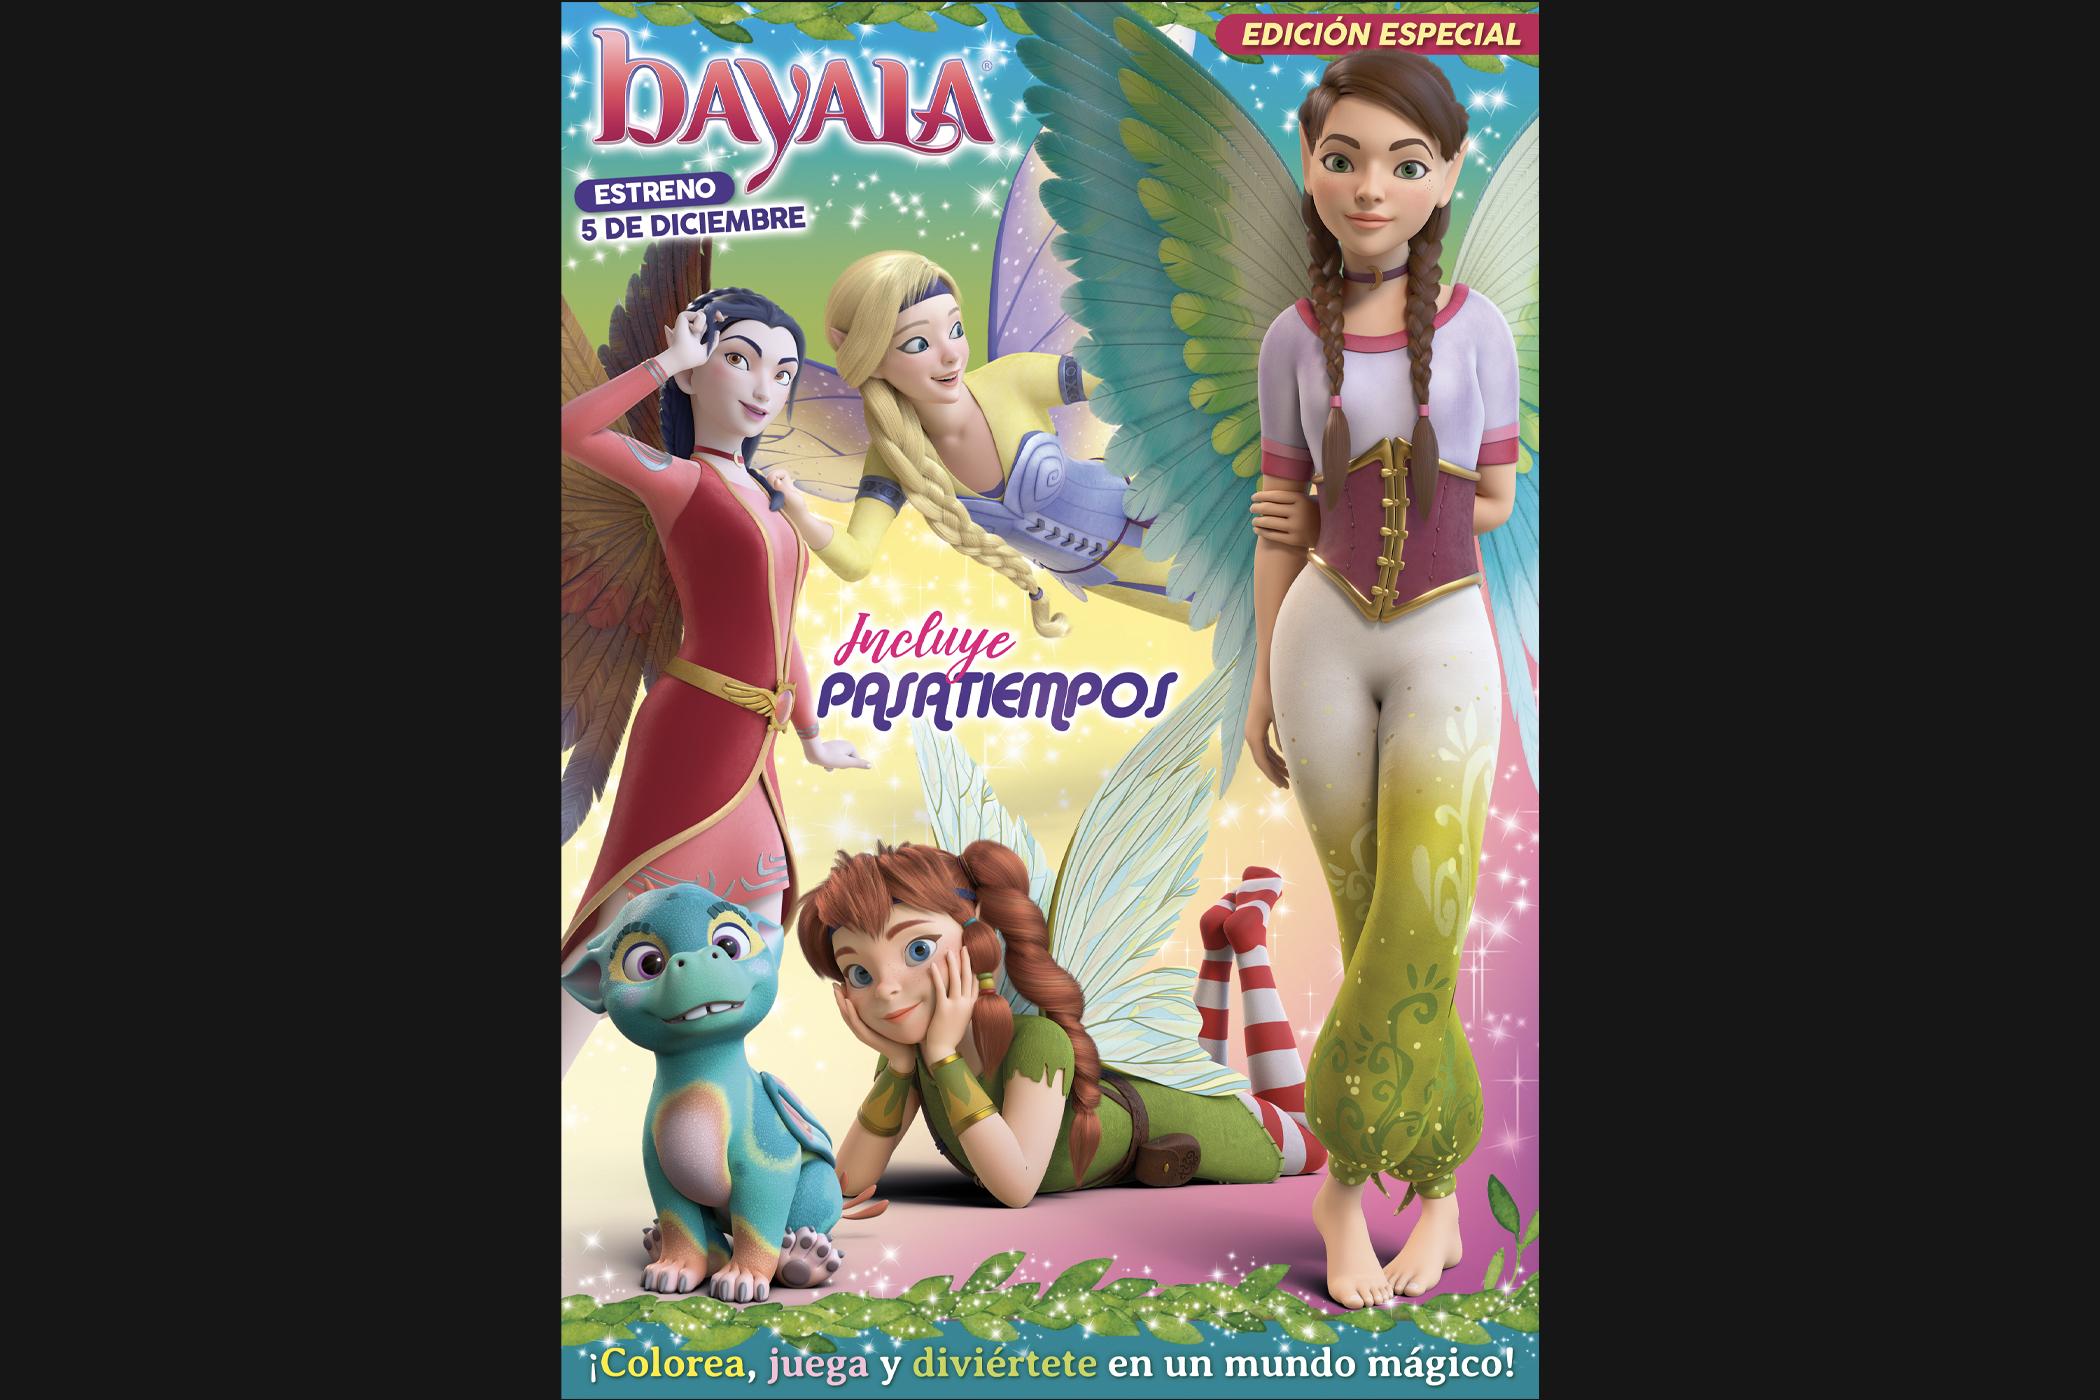 Especial de cine Bayala - Arte Gráfico